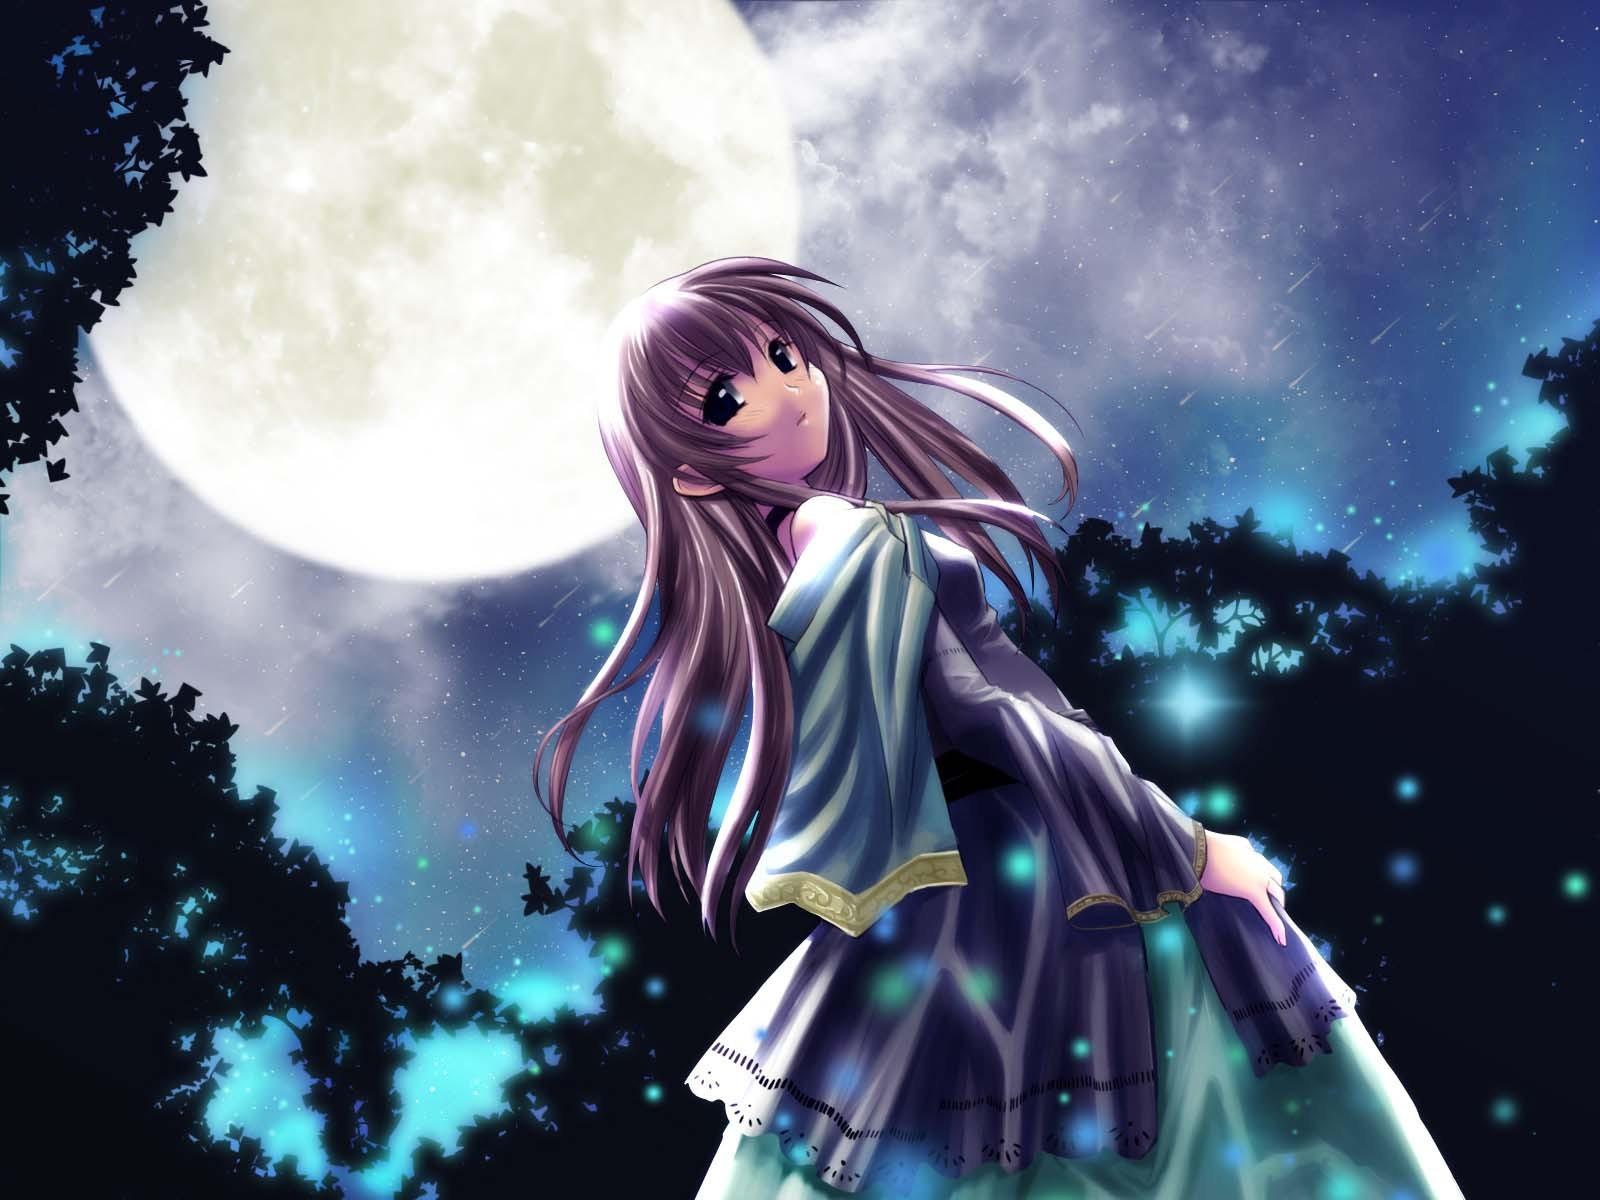 Hot anime wallpaper hd pixelstalk net - Cute anime girl wallpaper ...